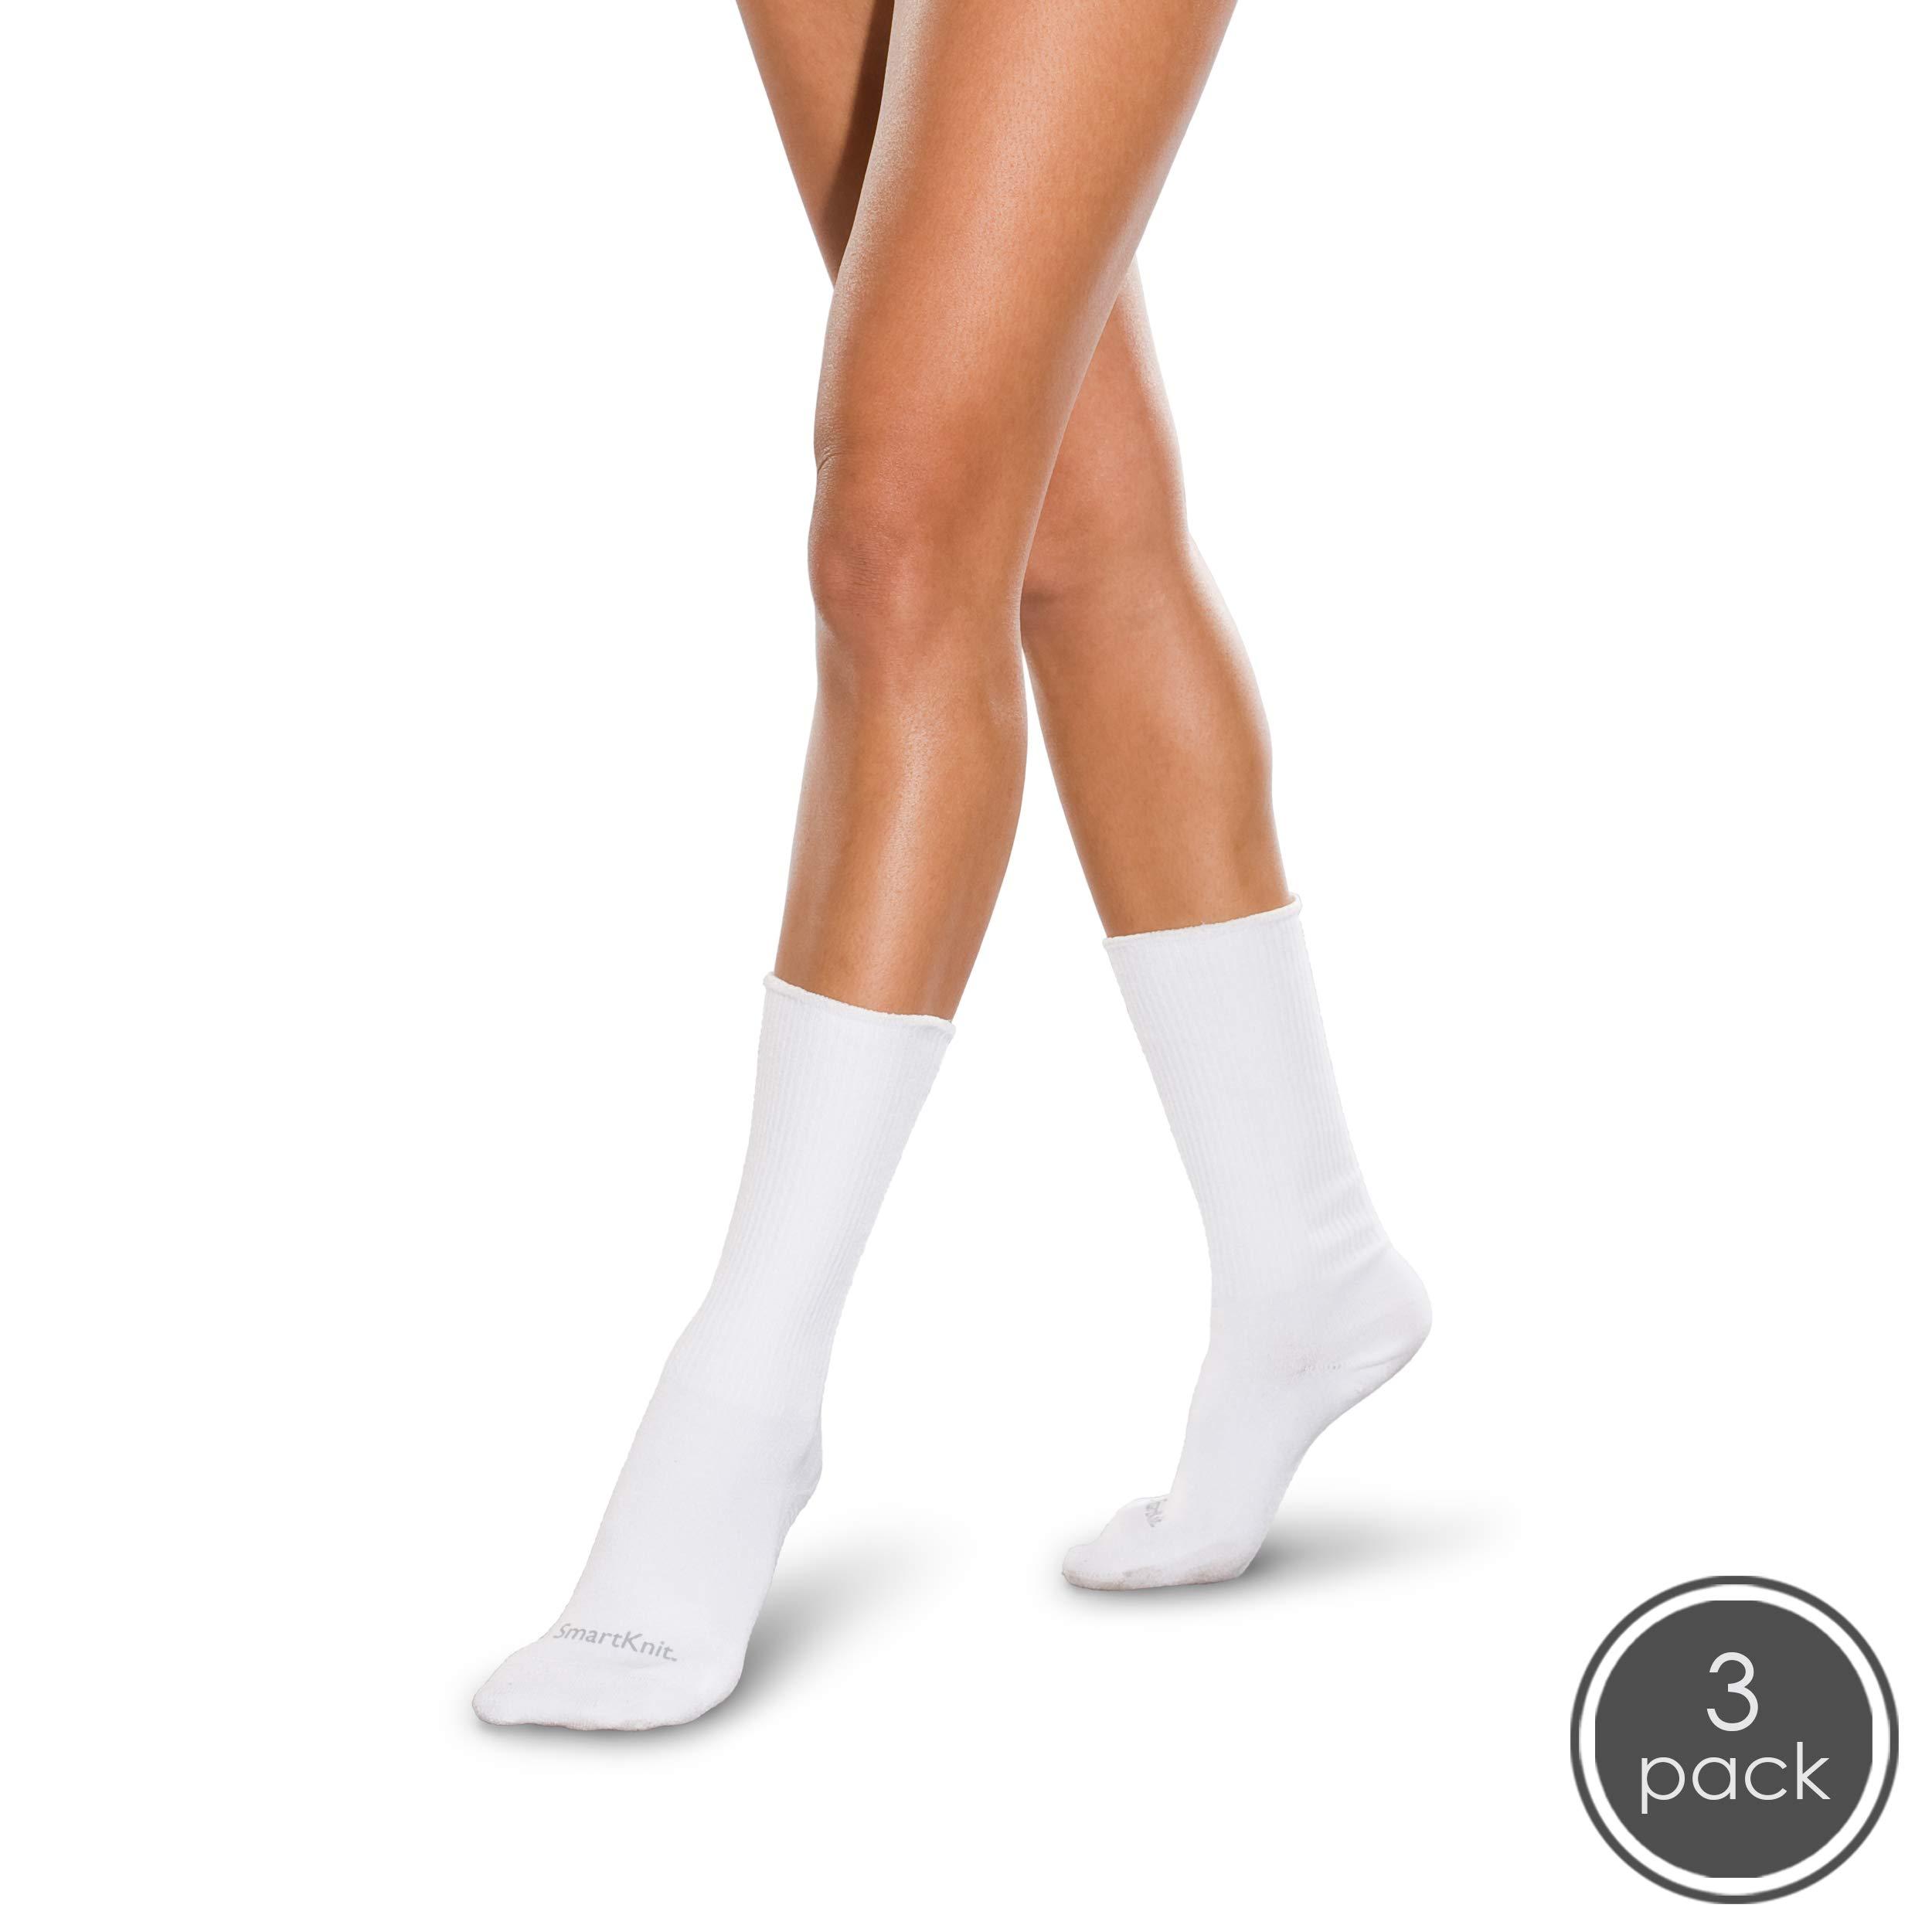 SmartKnit Seamless Diabetic Crew Socks 3 Pack - Medium - White by SmartKnit